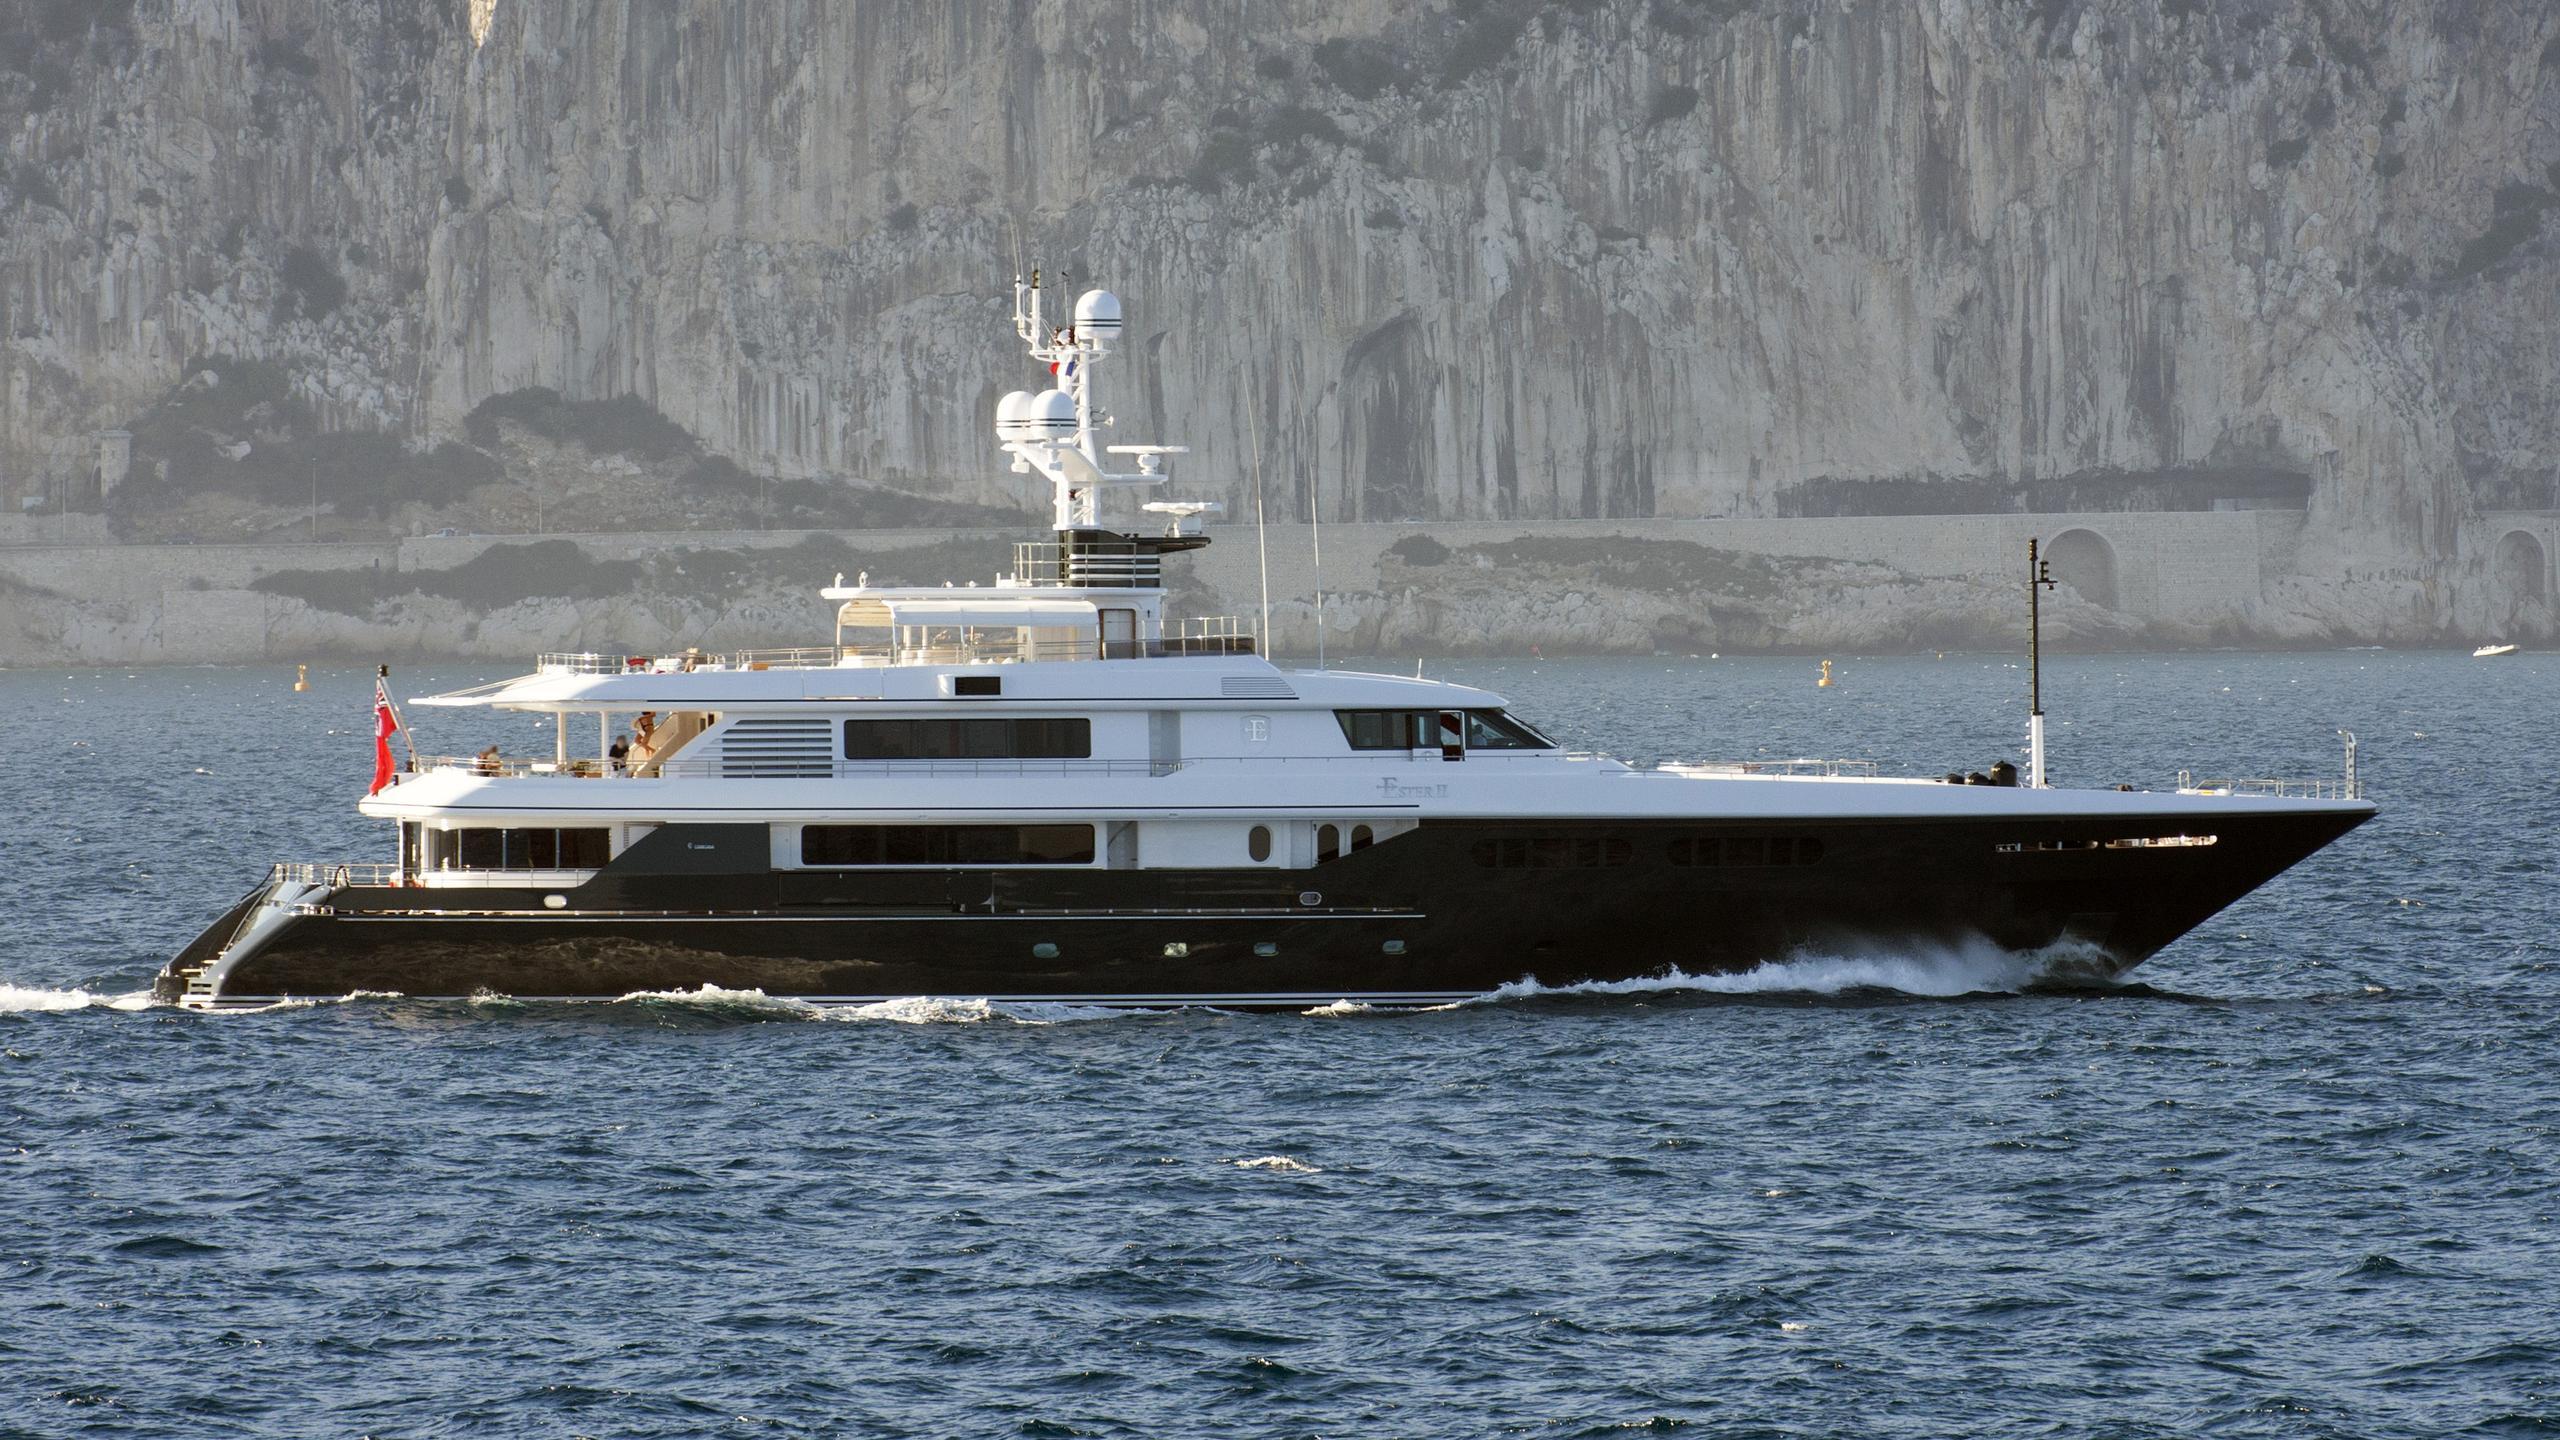 emerald ester ii motoryacht codecasa 51m 2005 profile